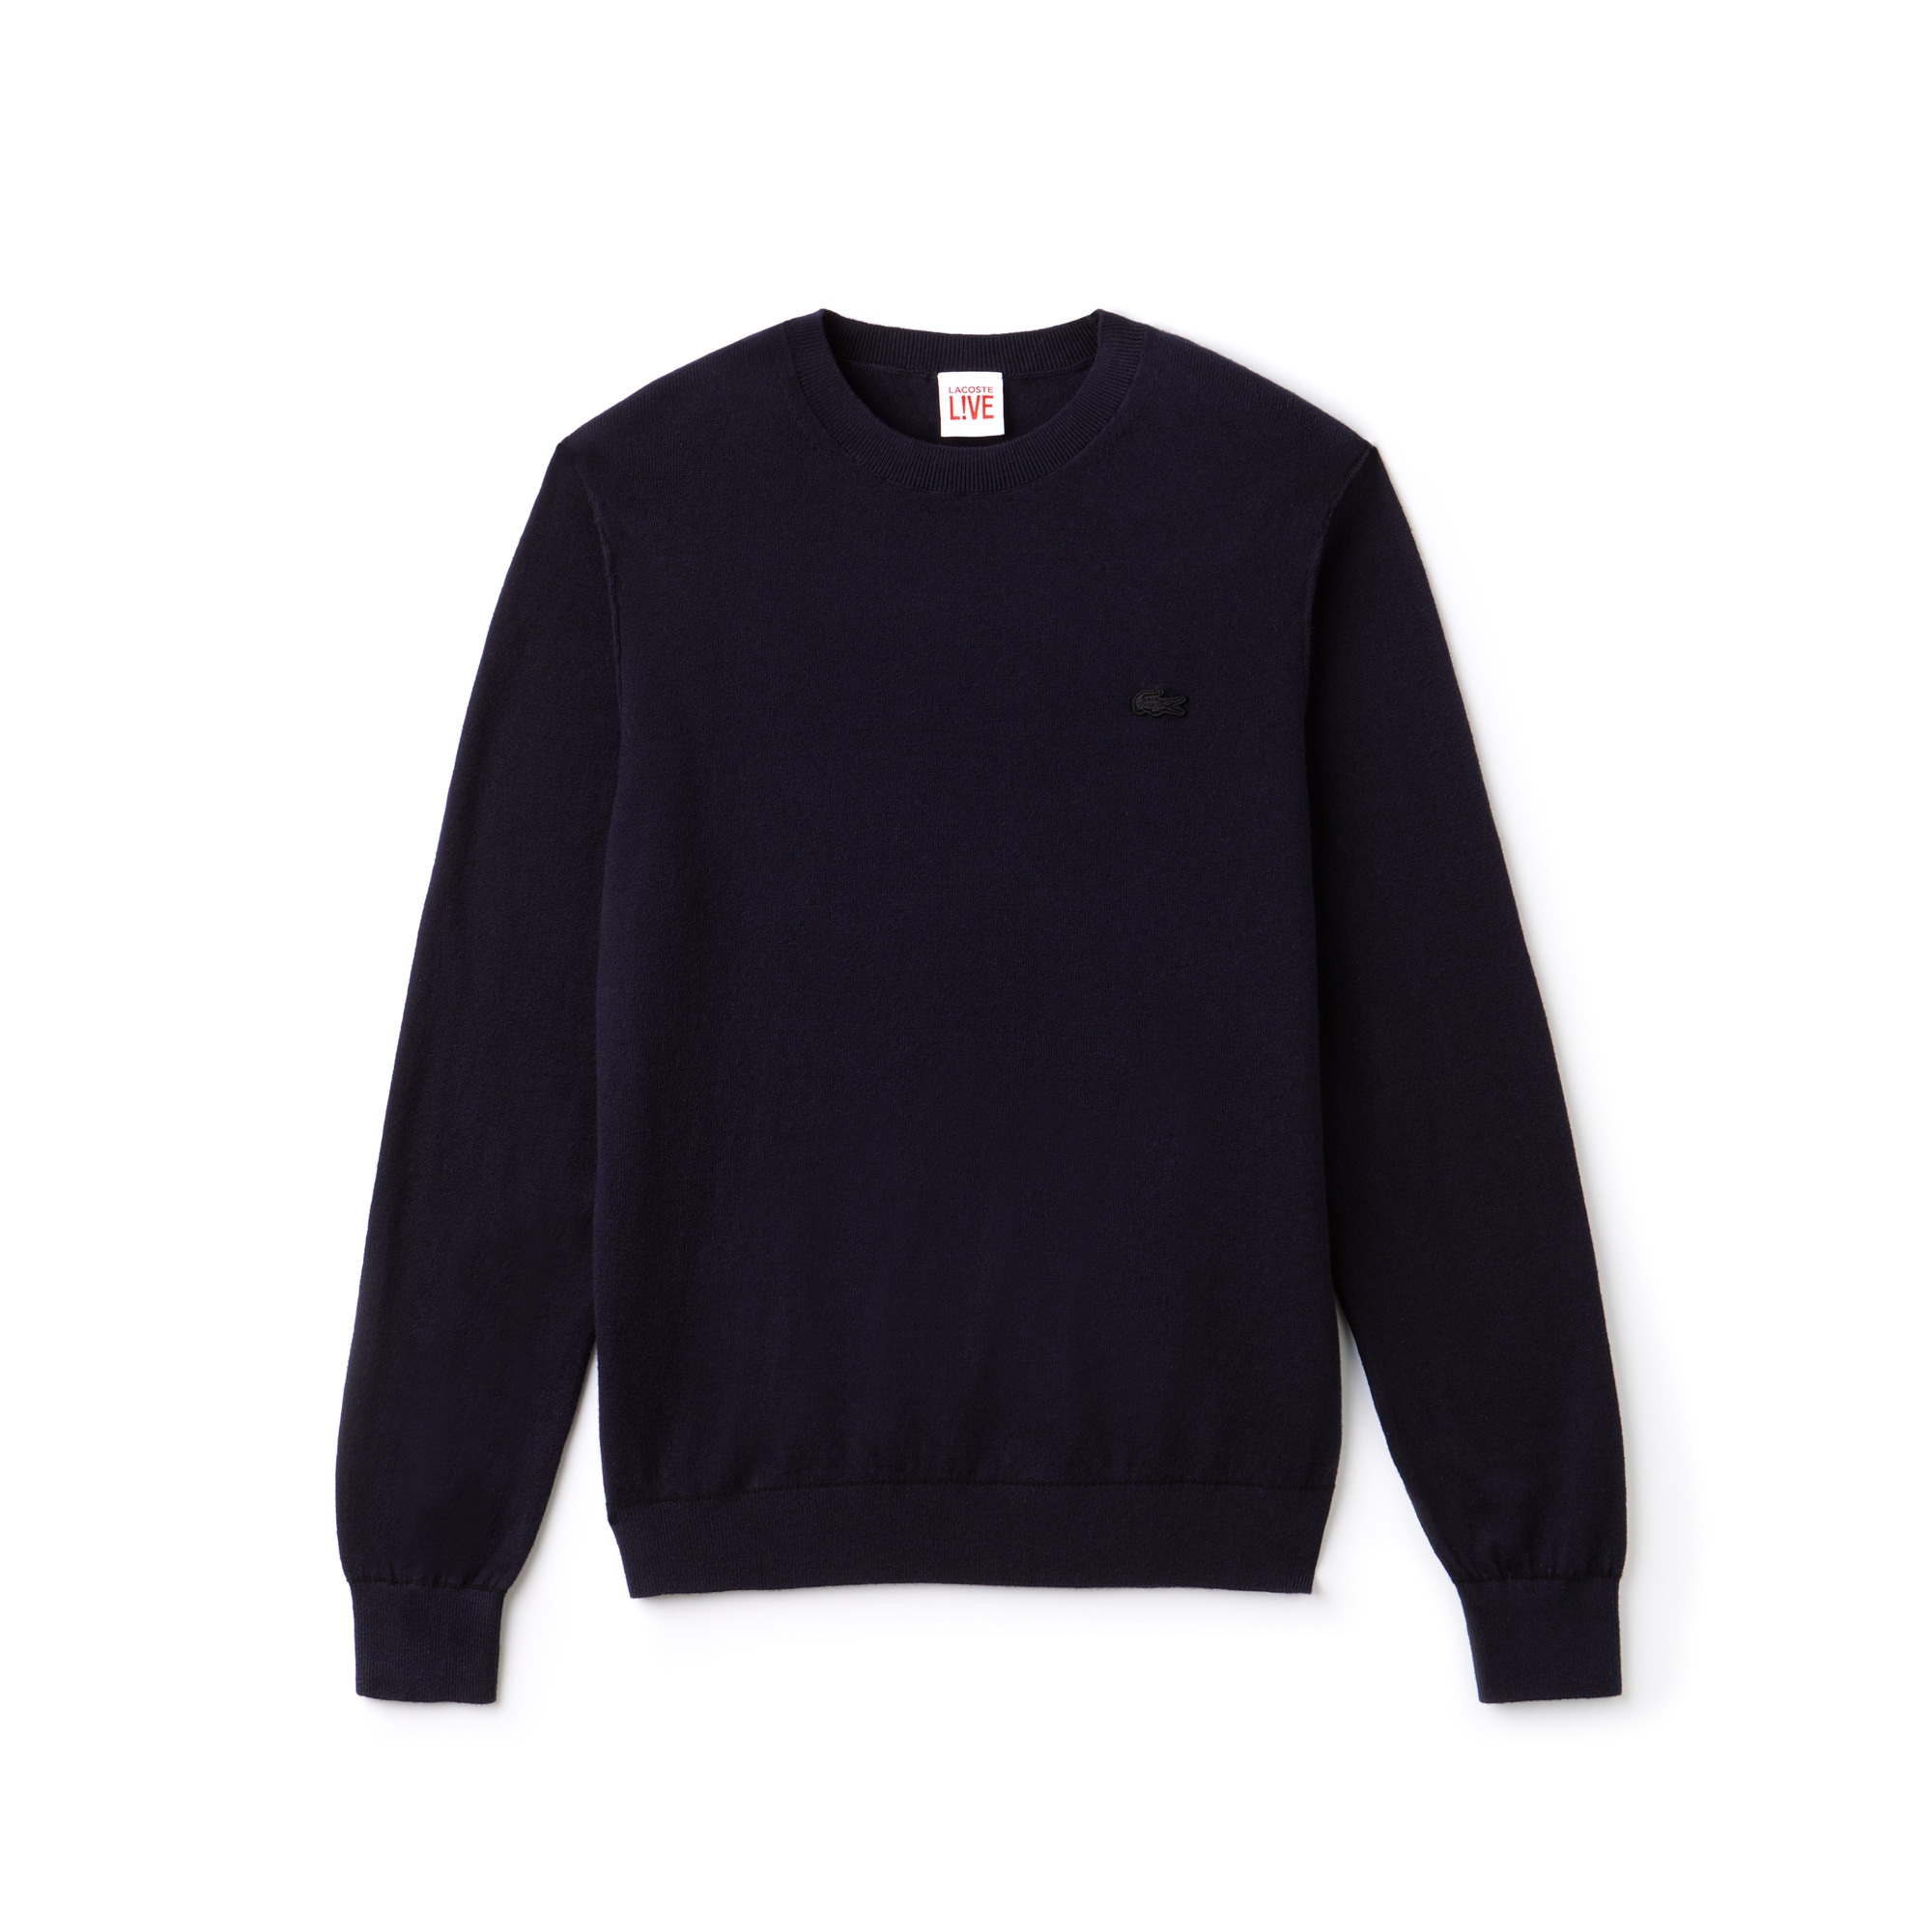 Lacoste LIVE男士圆领棉羊绒平纹单面针织毛衣